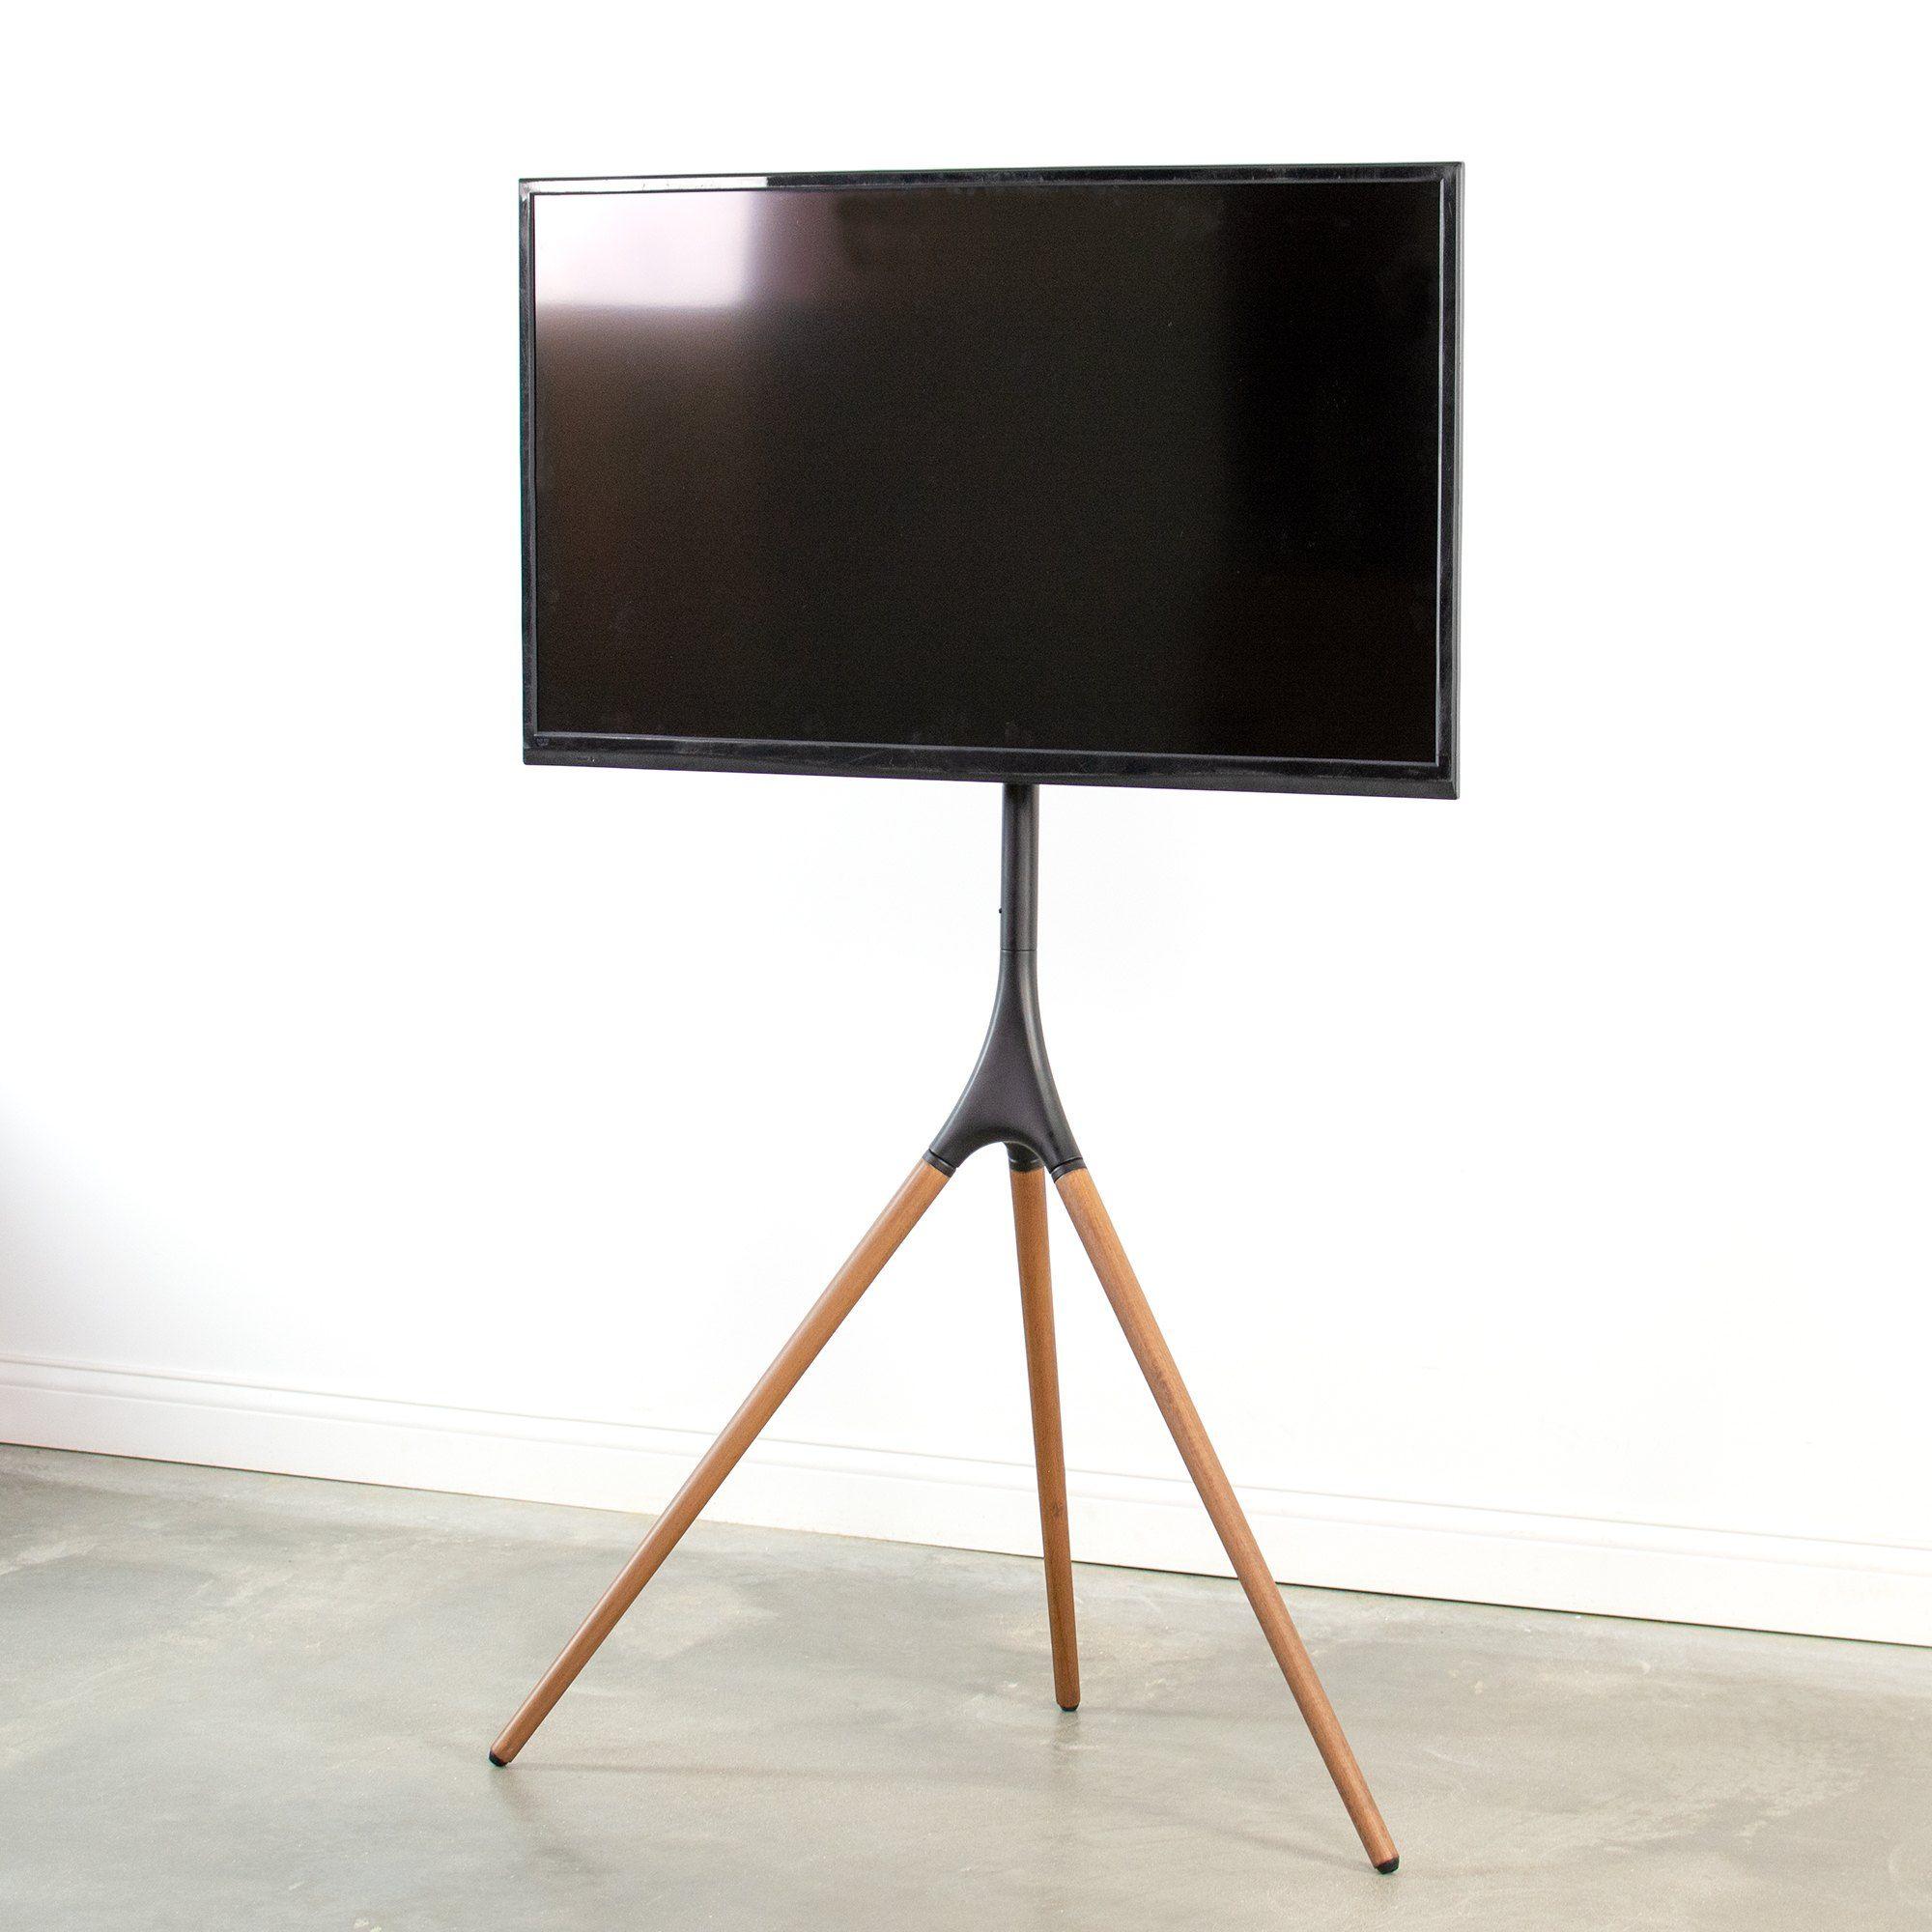 Vivo Artistic Easel Studio Tv Display Stand Adjustable Tv Mount